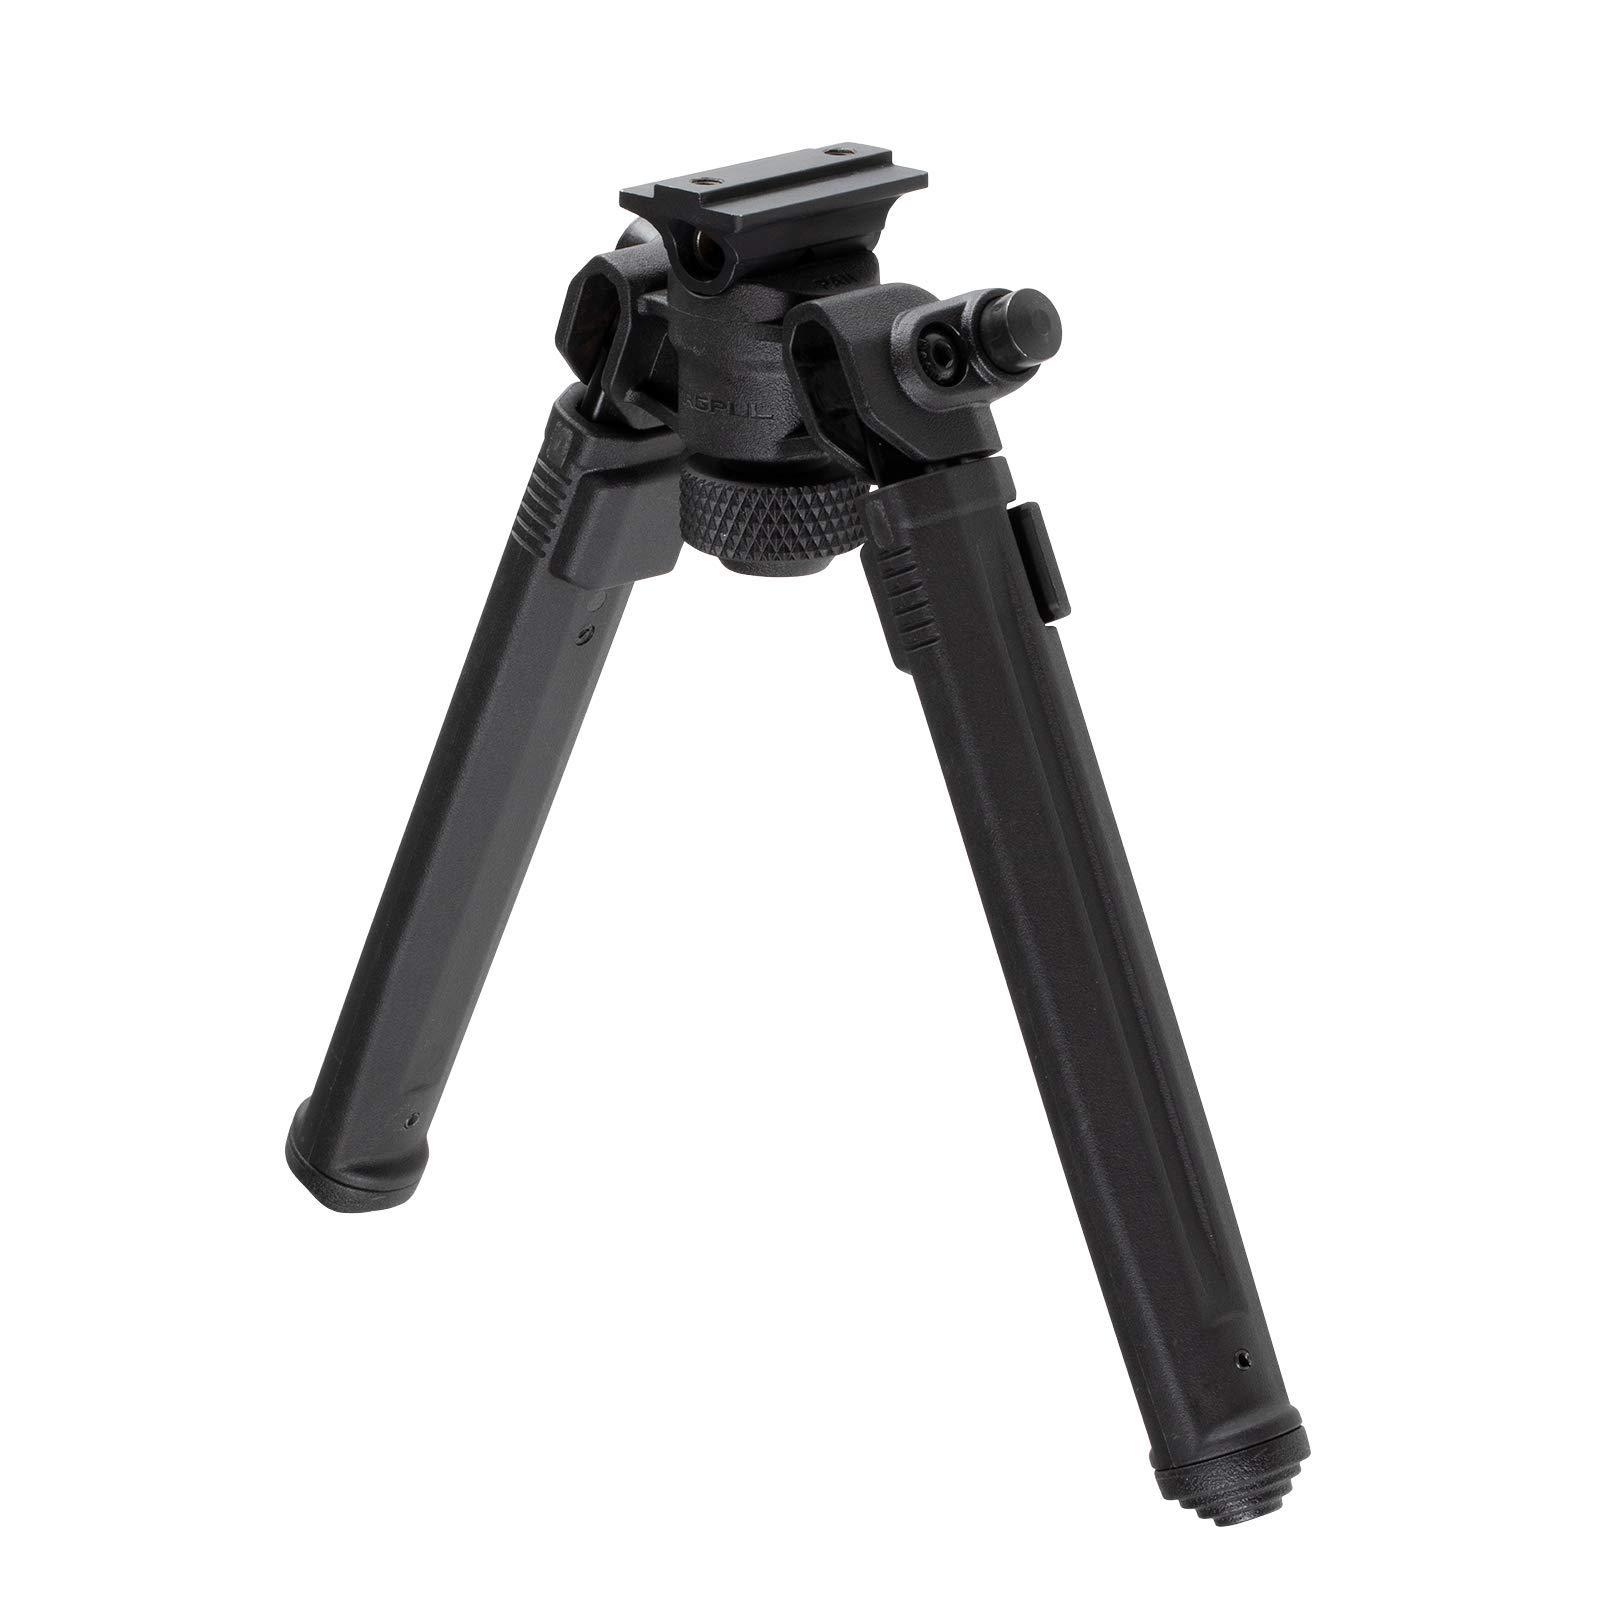 Magpul Rifle Bipod, A.R.M.S. 17S Style, Black